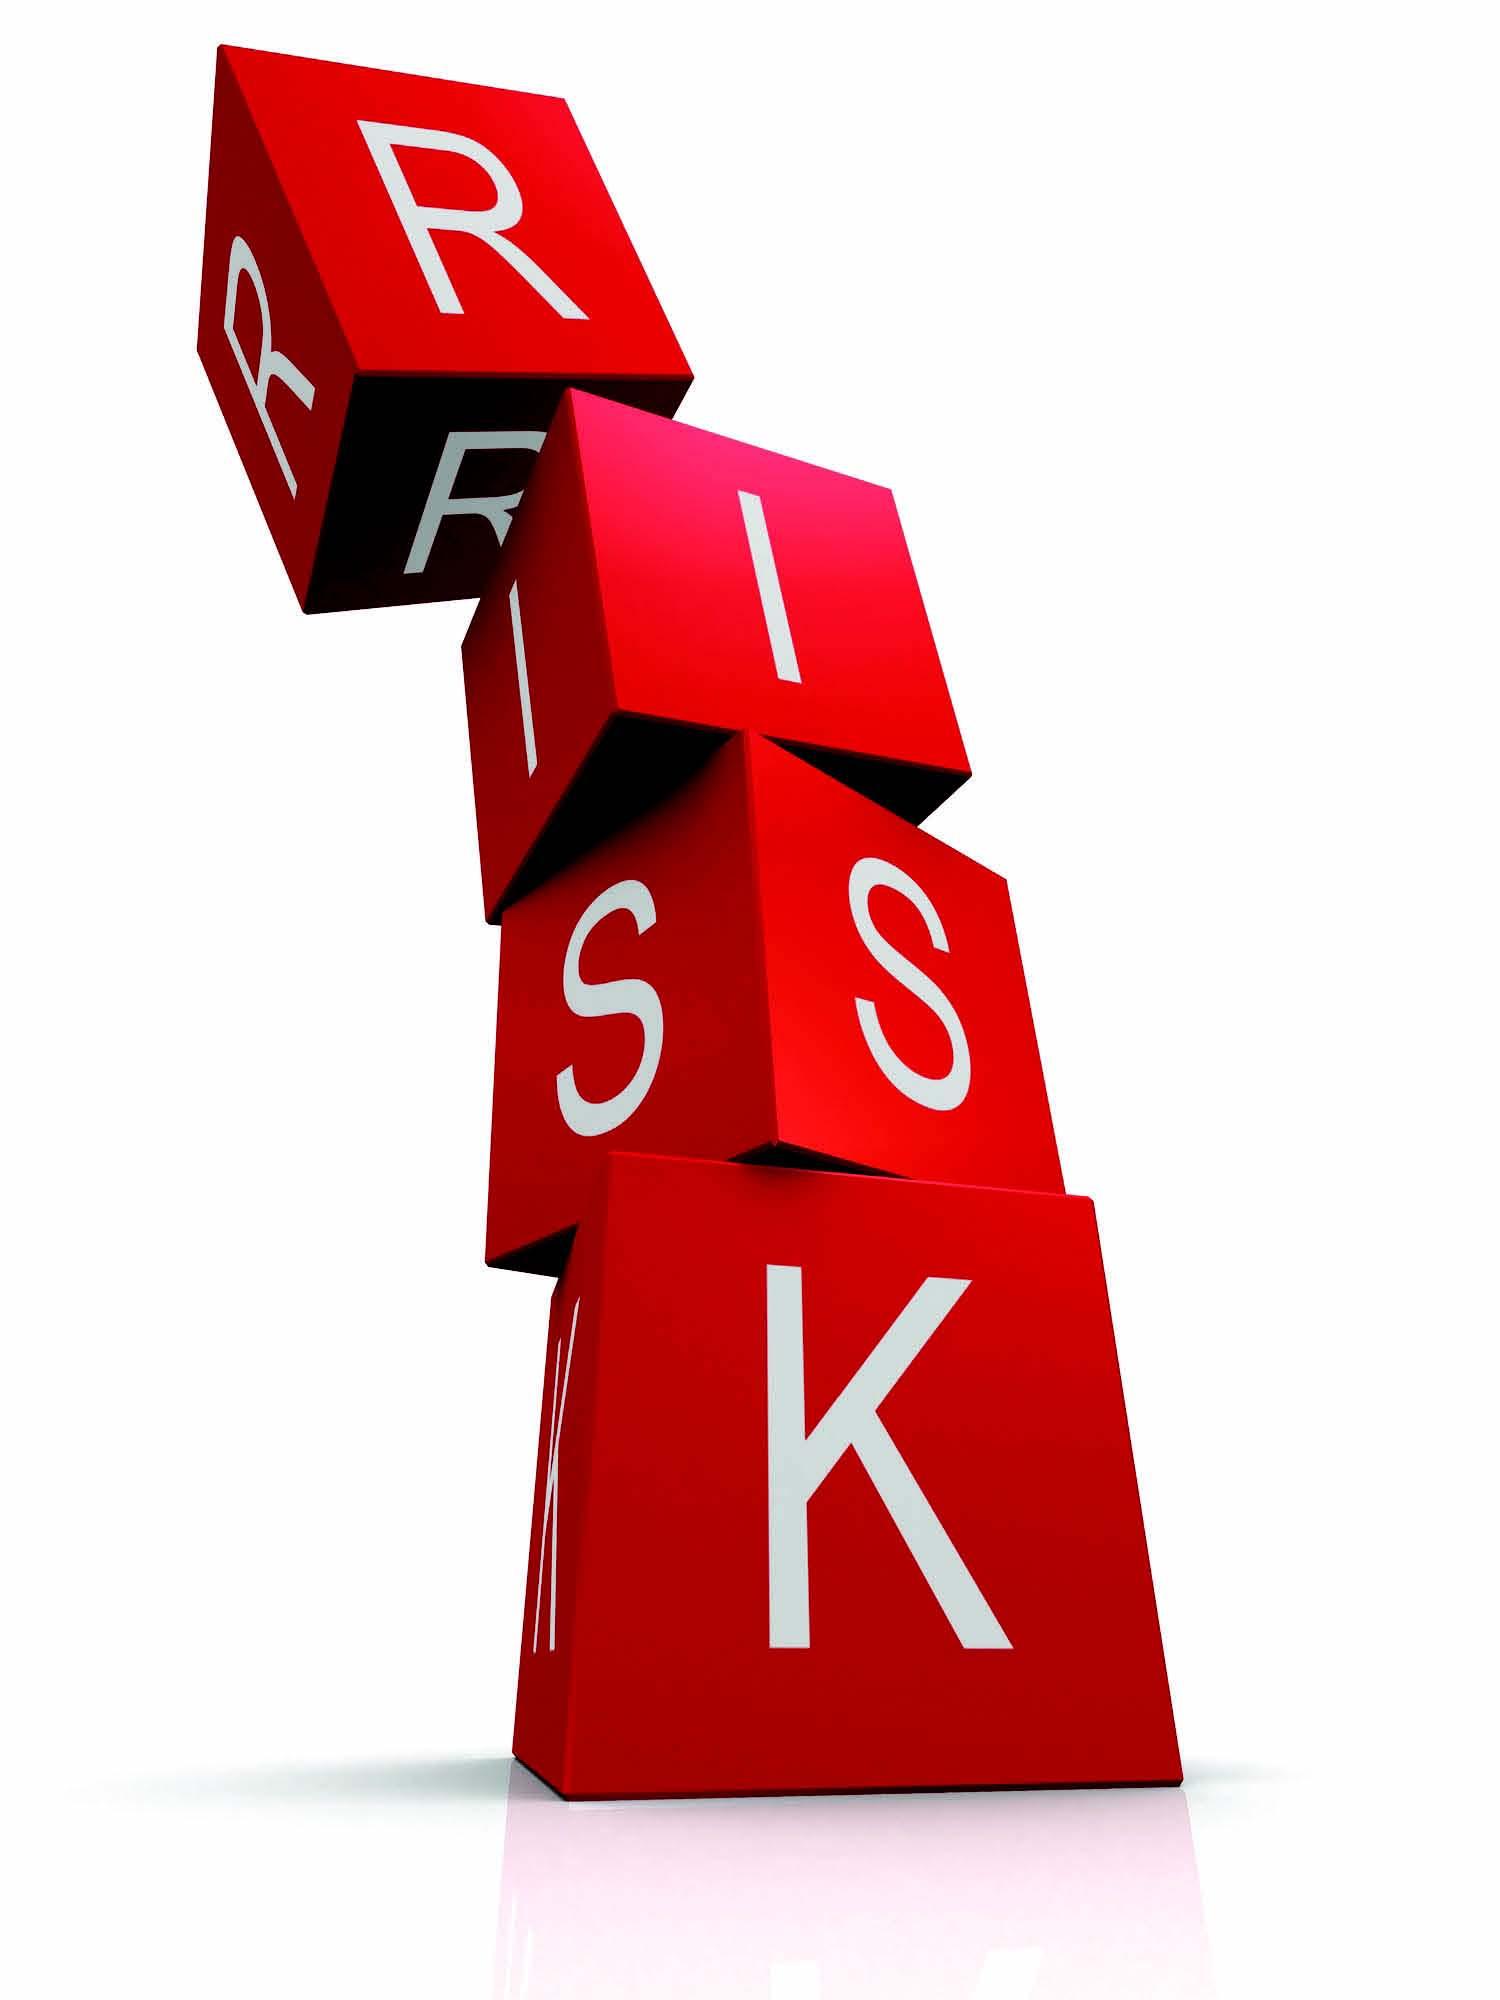 Sharepoint assessments cipherpoint software. Assessment clipart risk assessment